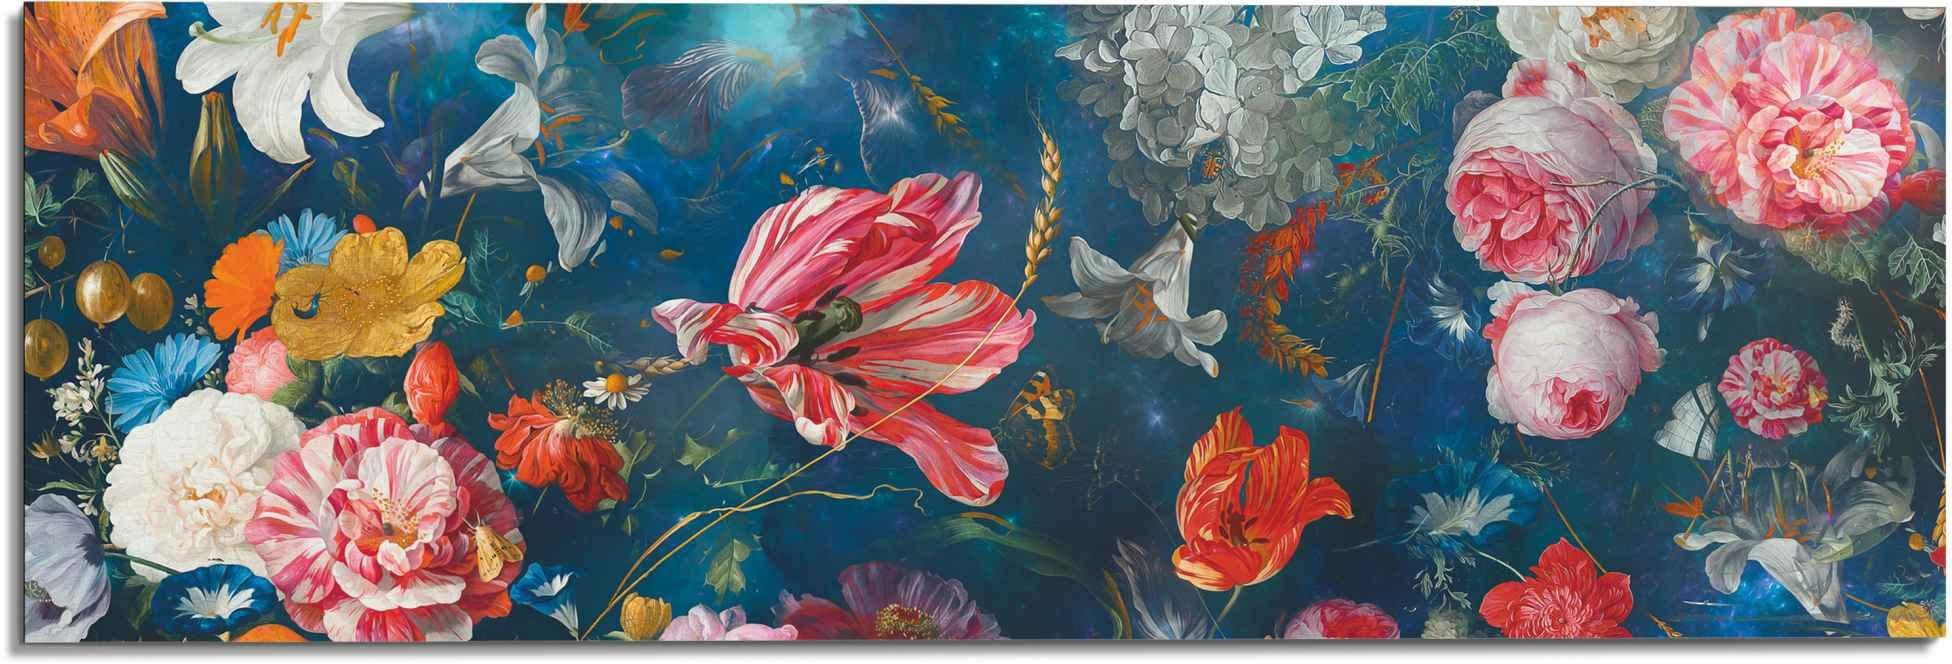 Reinders! artprint Wandbild Blumenwelt Farbenfroh - Blumen - Pflanzen (1 stuk) - verschillende betaalmethodes